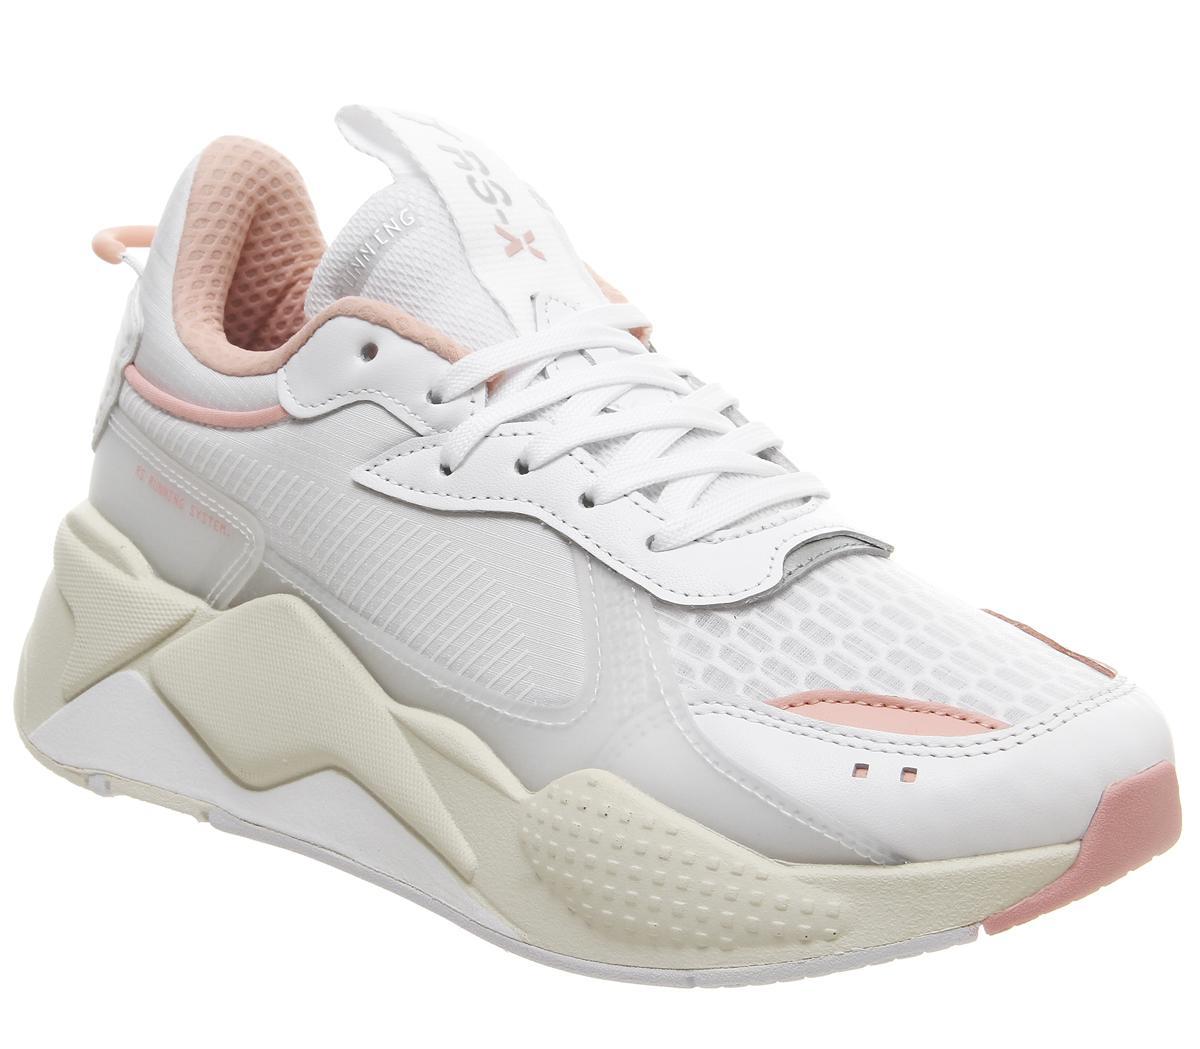 Puma Rs-x Tech Trainers White Peach - Sneaker damen